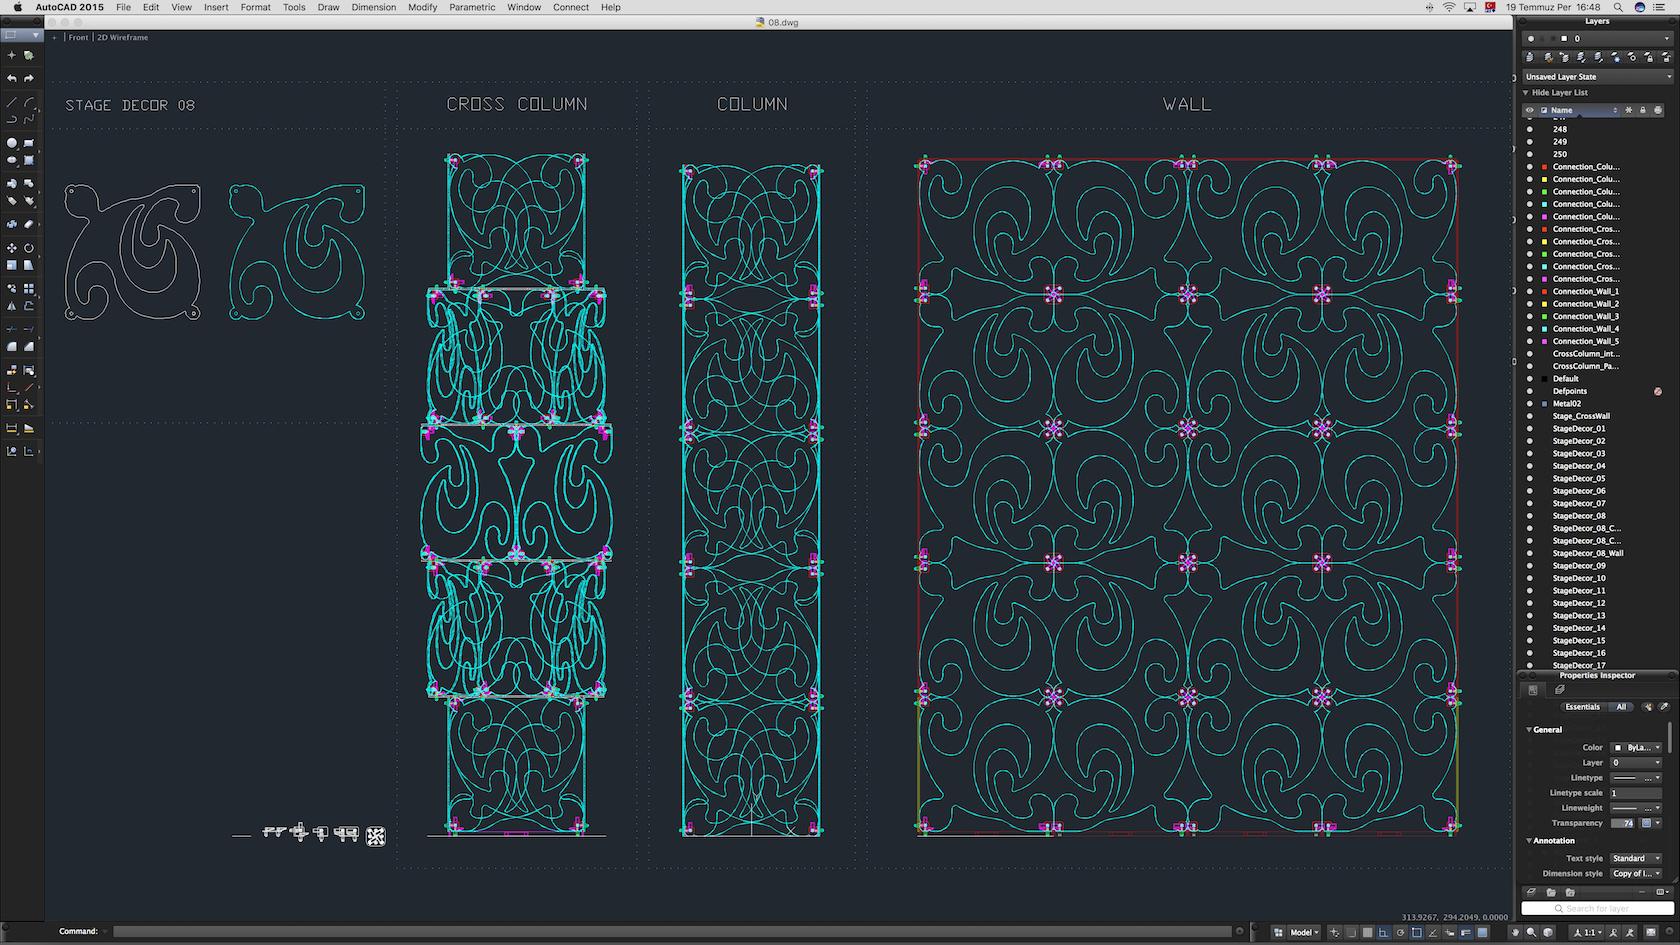 70-Cad-08-01-1680.jpg Download STL file Stage Decor Collection 01 (Modular 9 Pieces) • 3D printer model, akerStudio